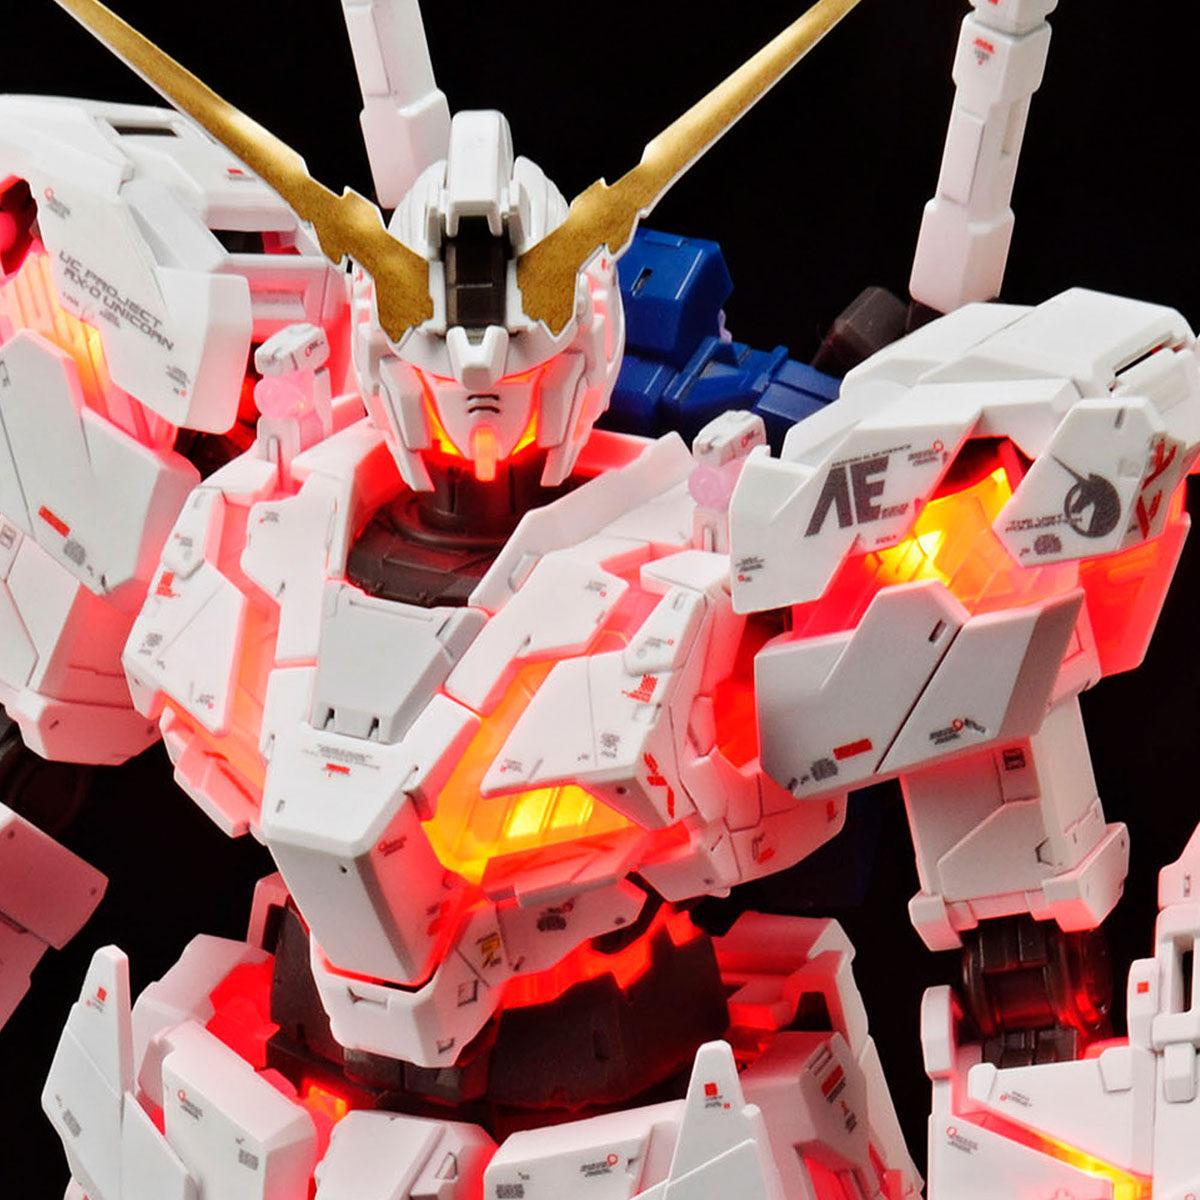 RG 1/144『ガンダムベース限定 RX-0 ユニコーンガンダム(デストロイモード)Ver.TWC(LIGHTING MODEL)』プラモデル-001